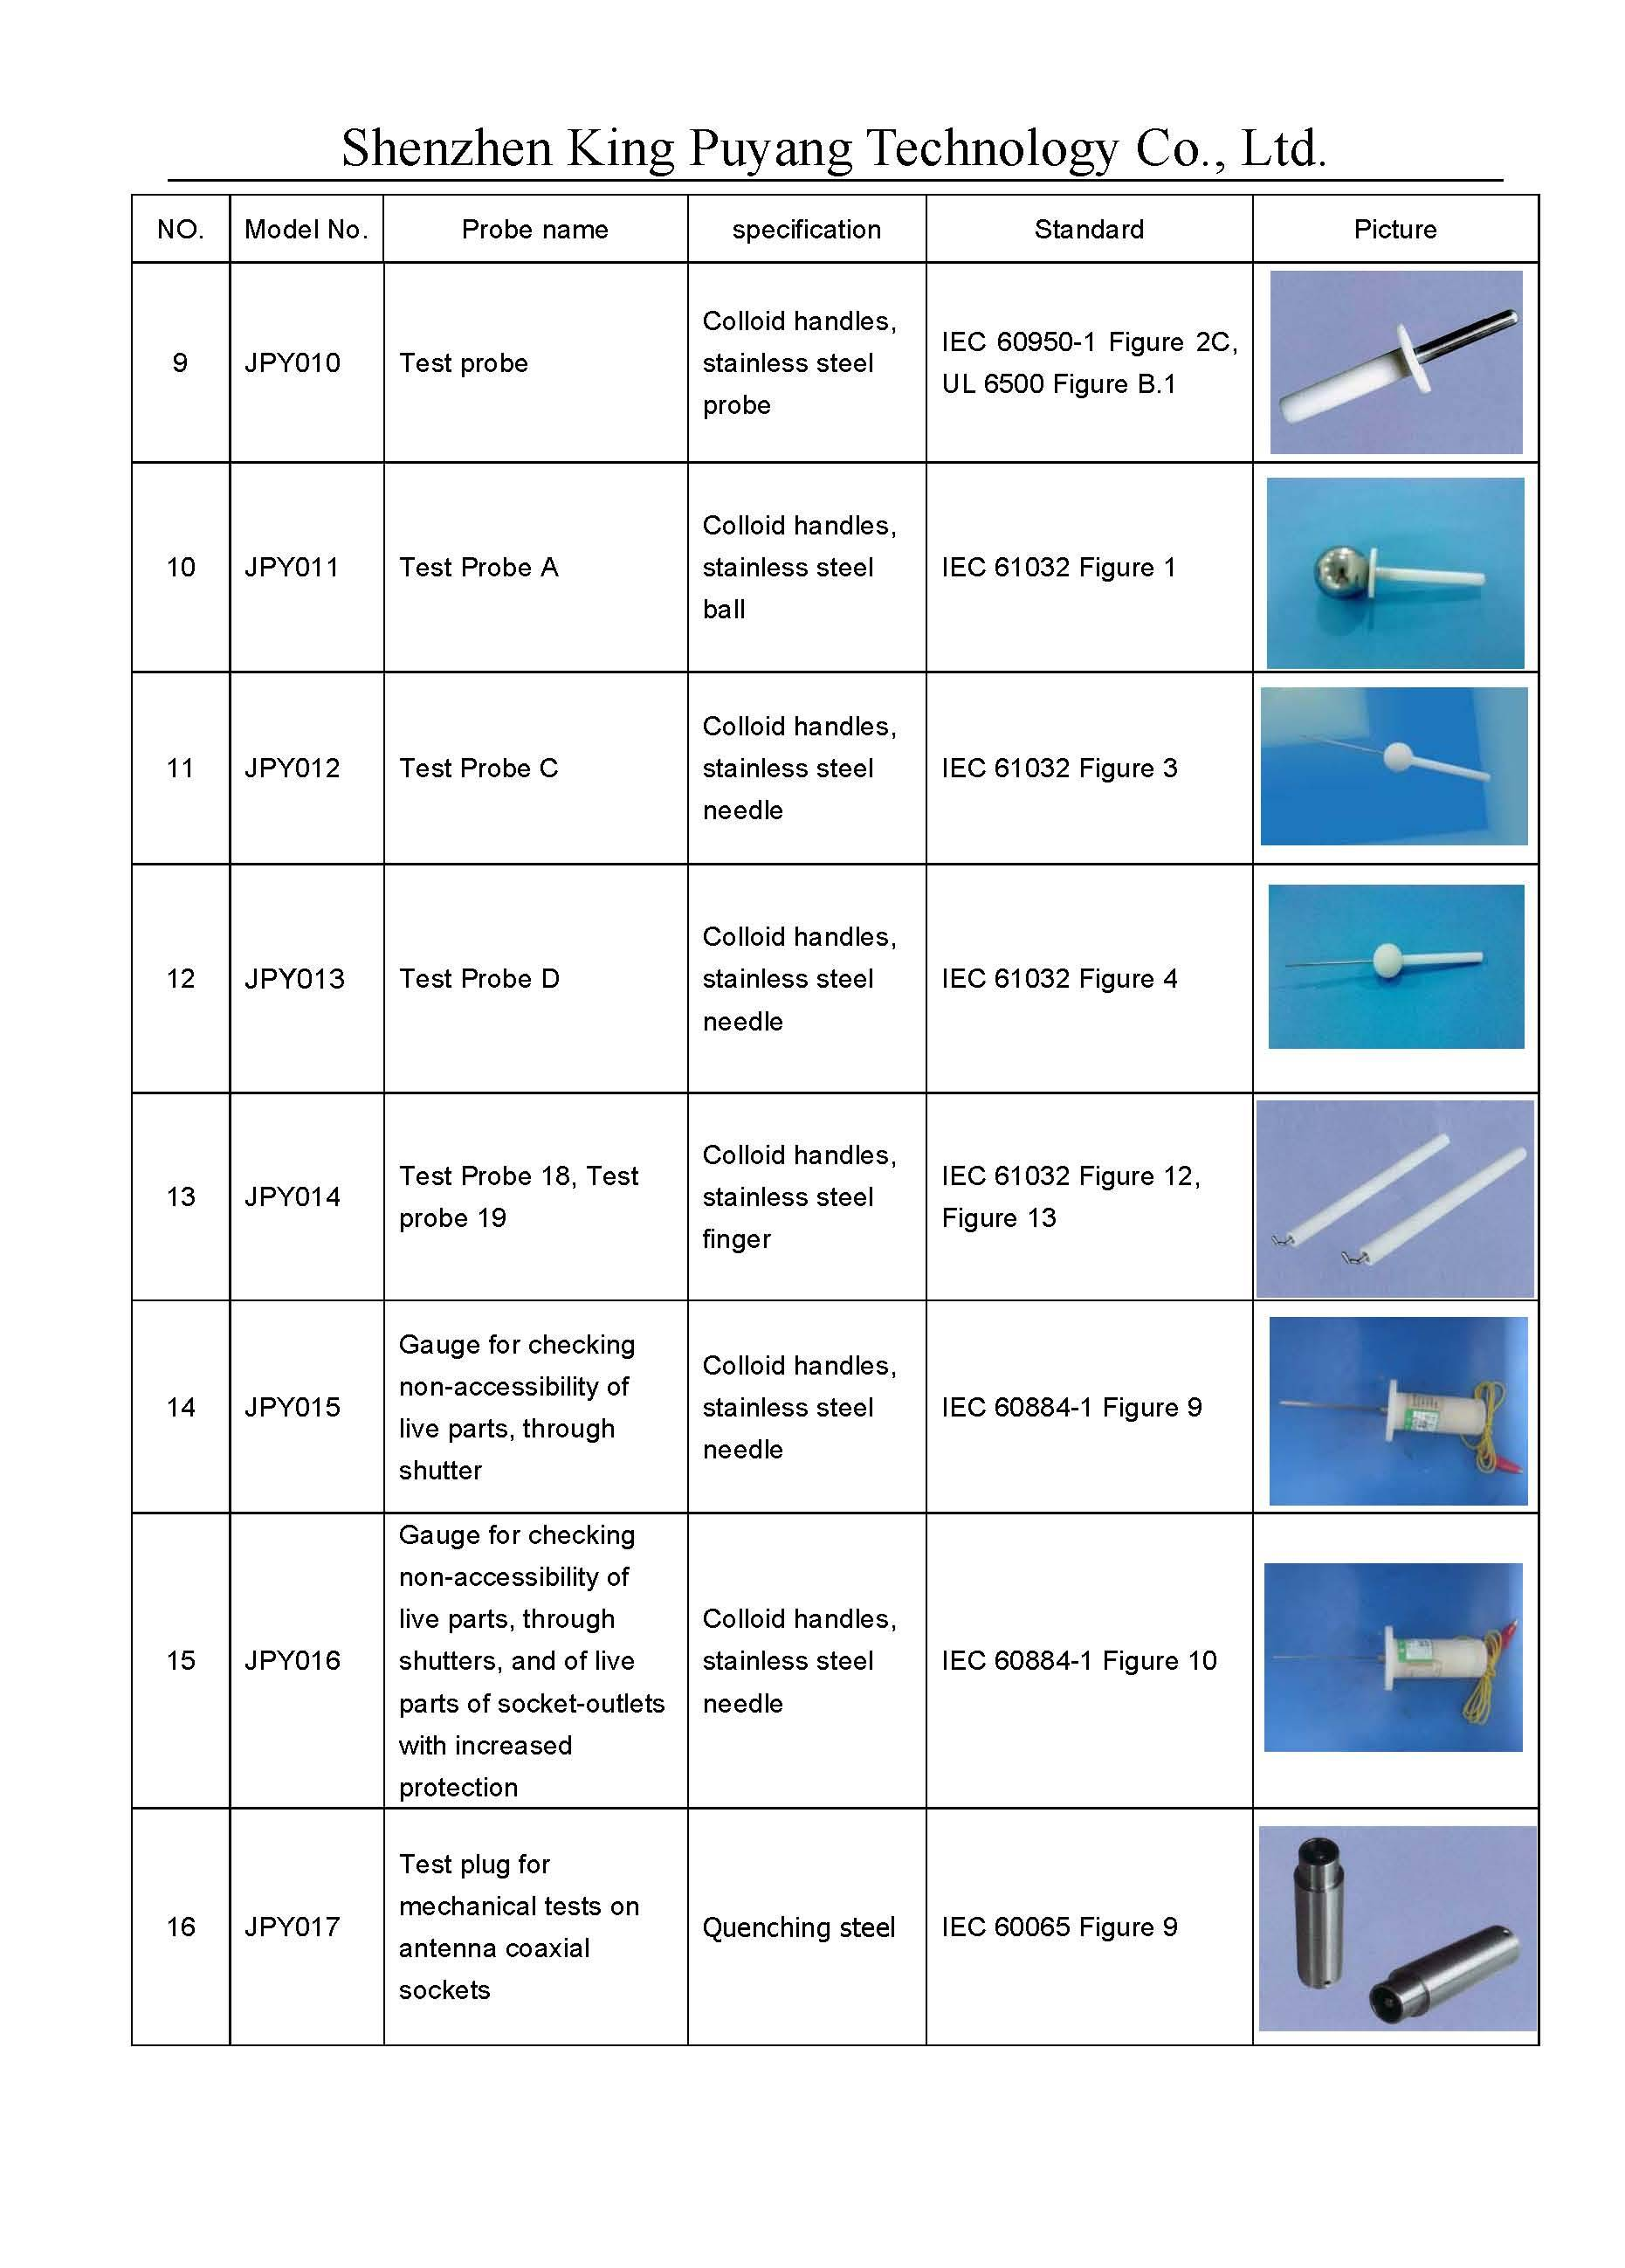 Test probe series 2